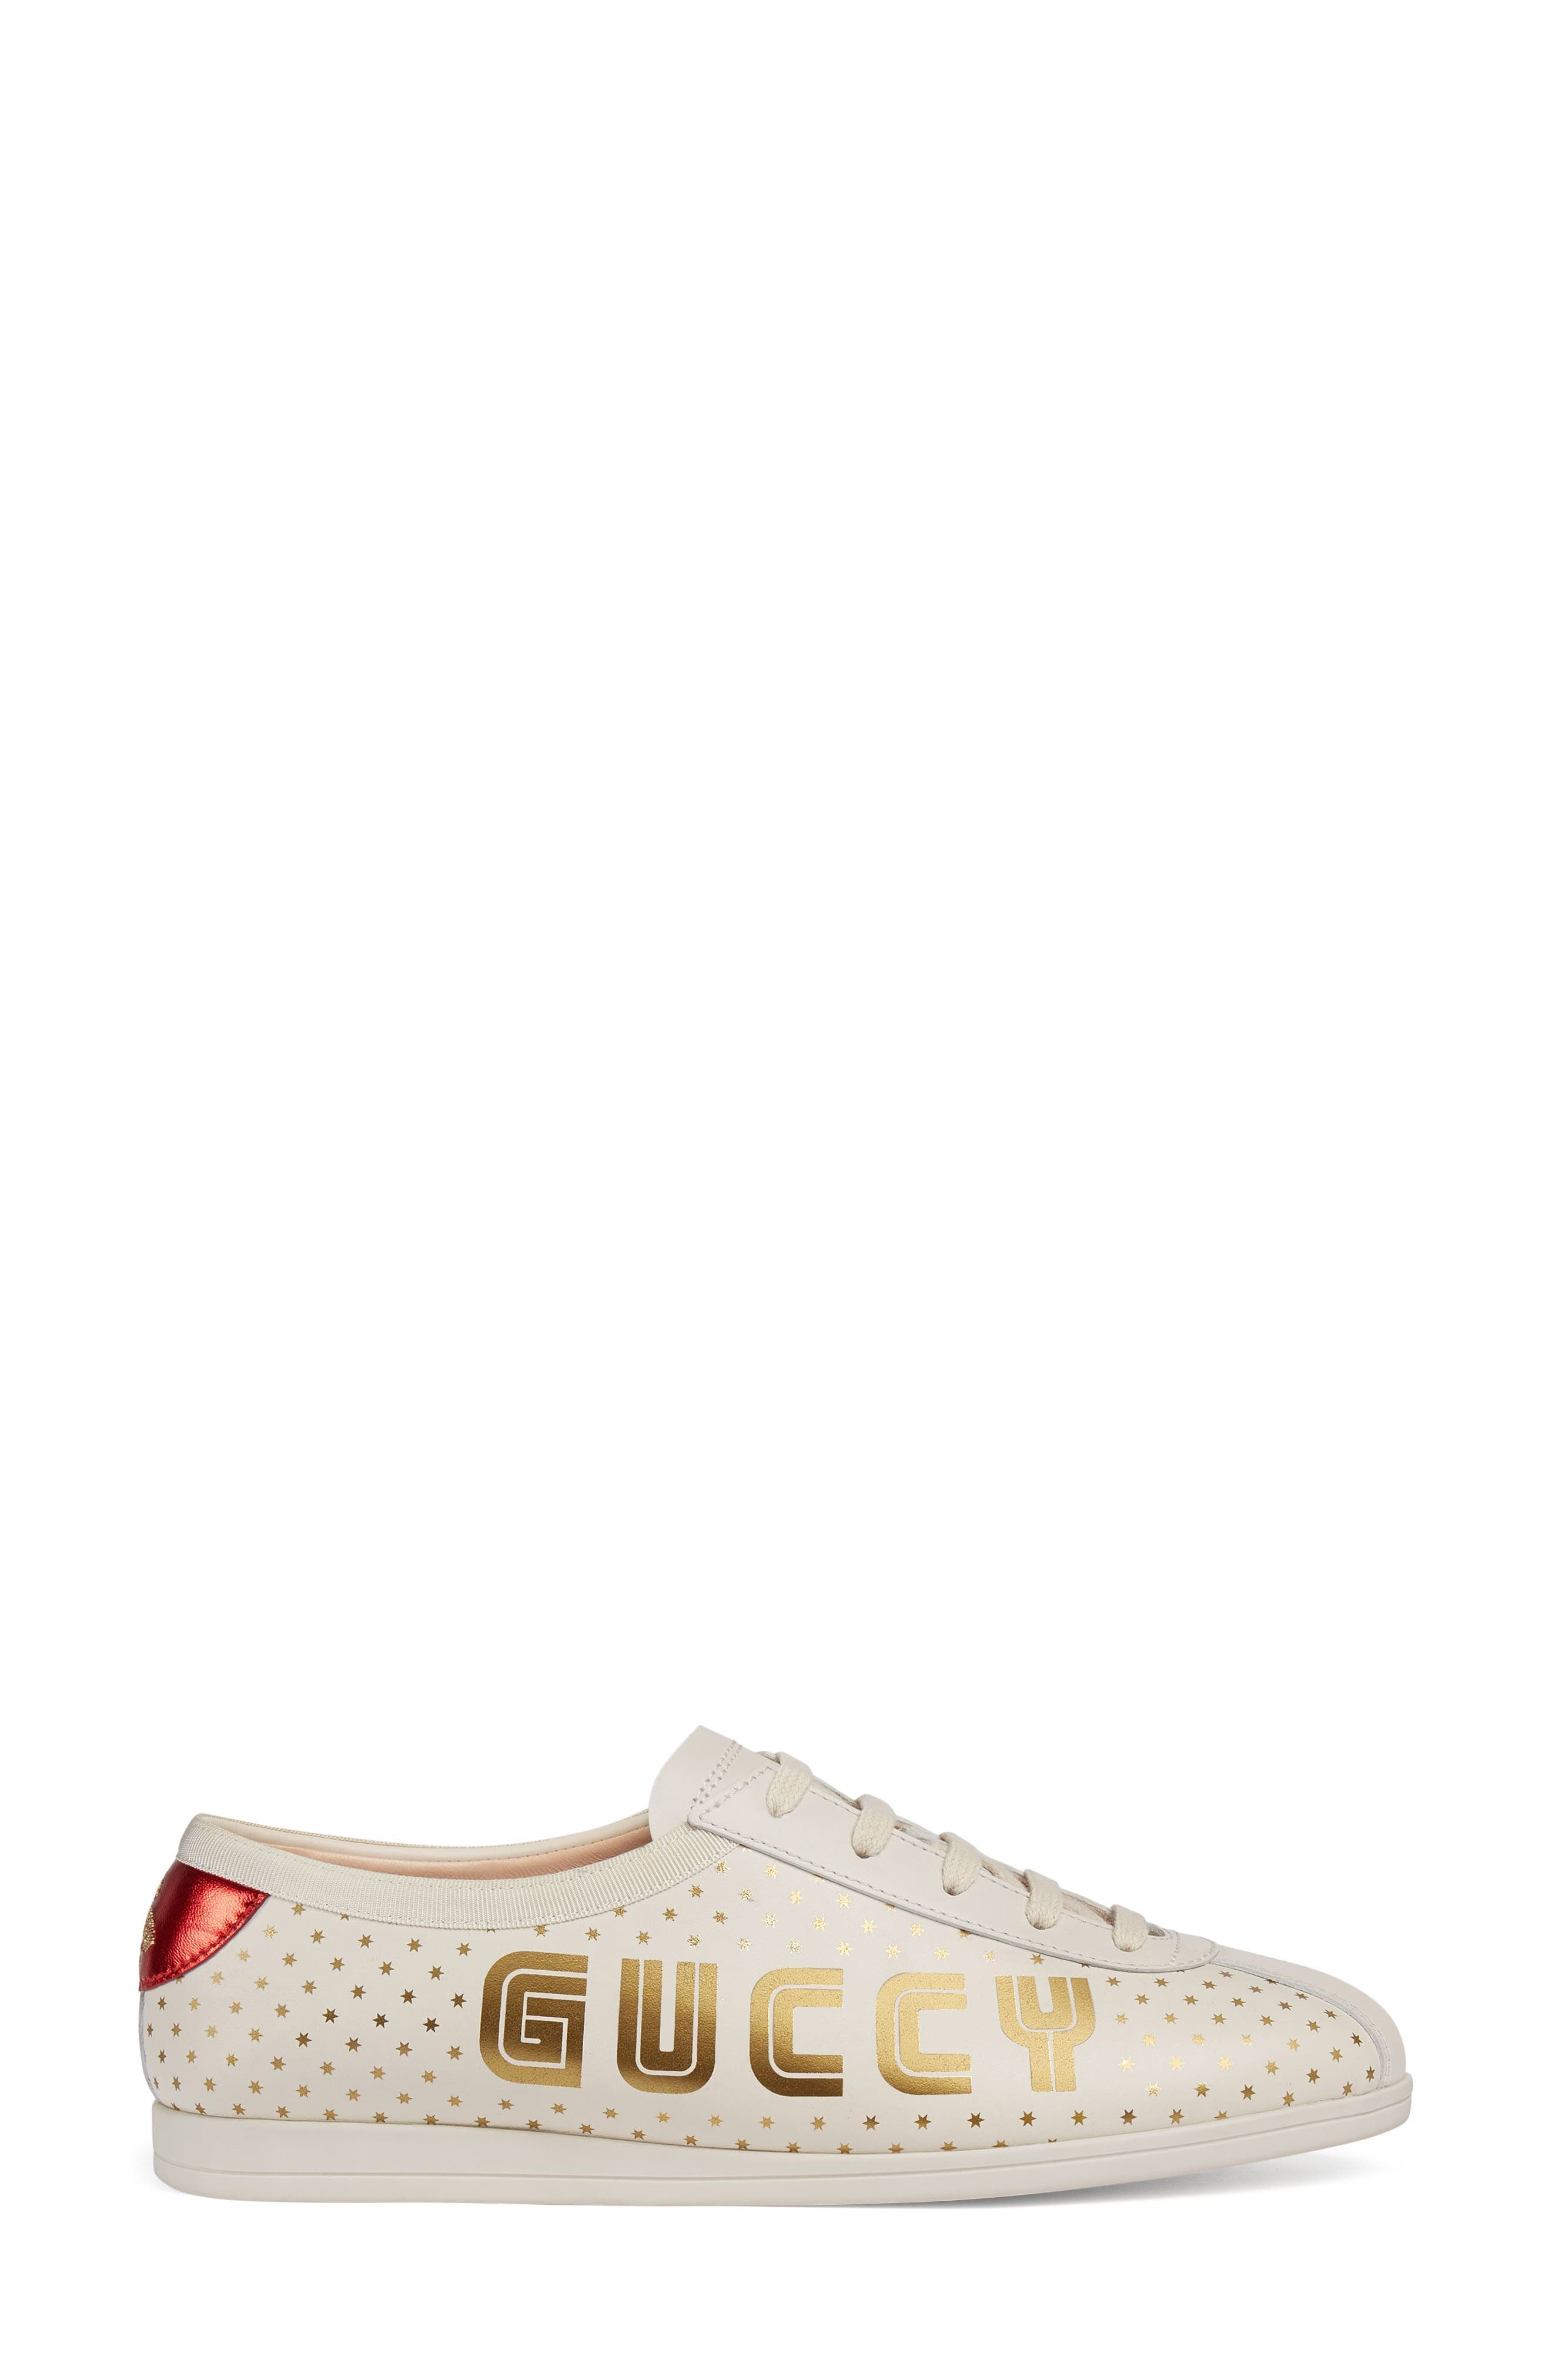 Falacer Guccy Logo Sneaker,                             Alternate thumbnail 2, color,                             White